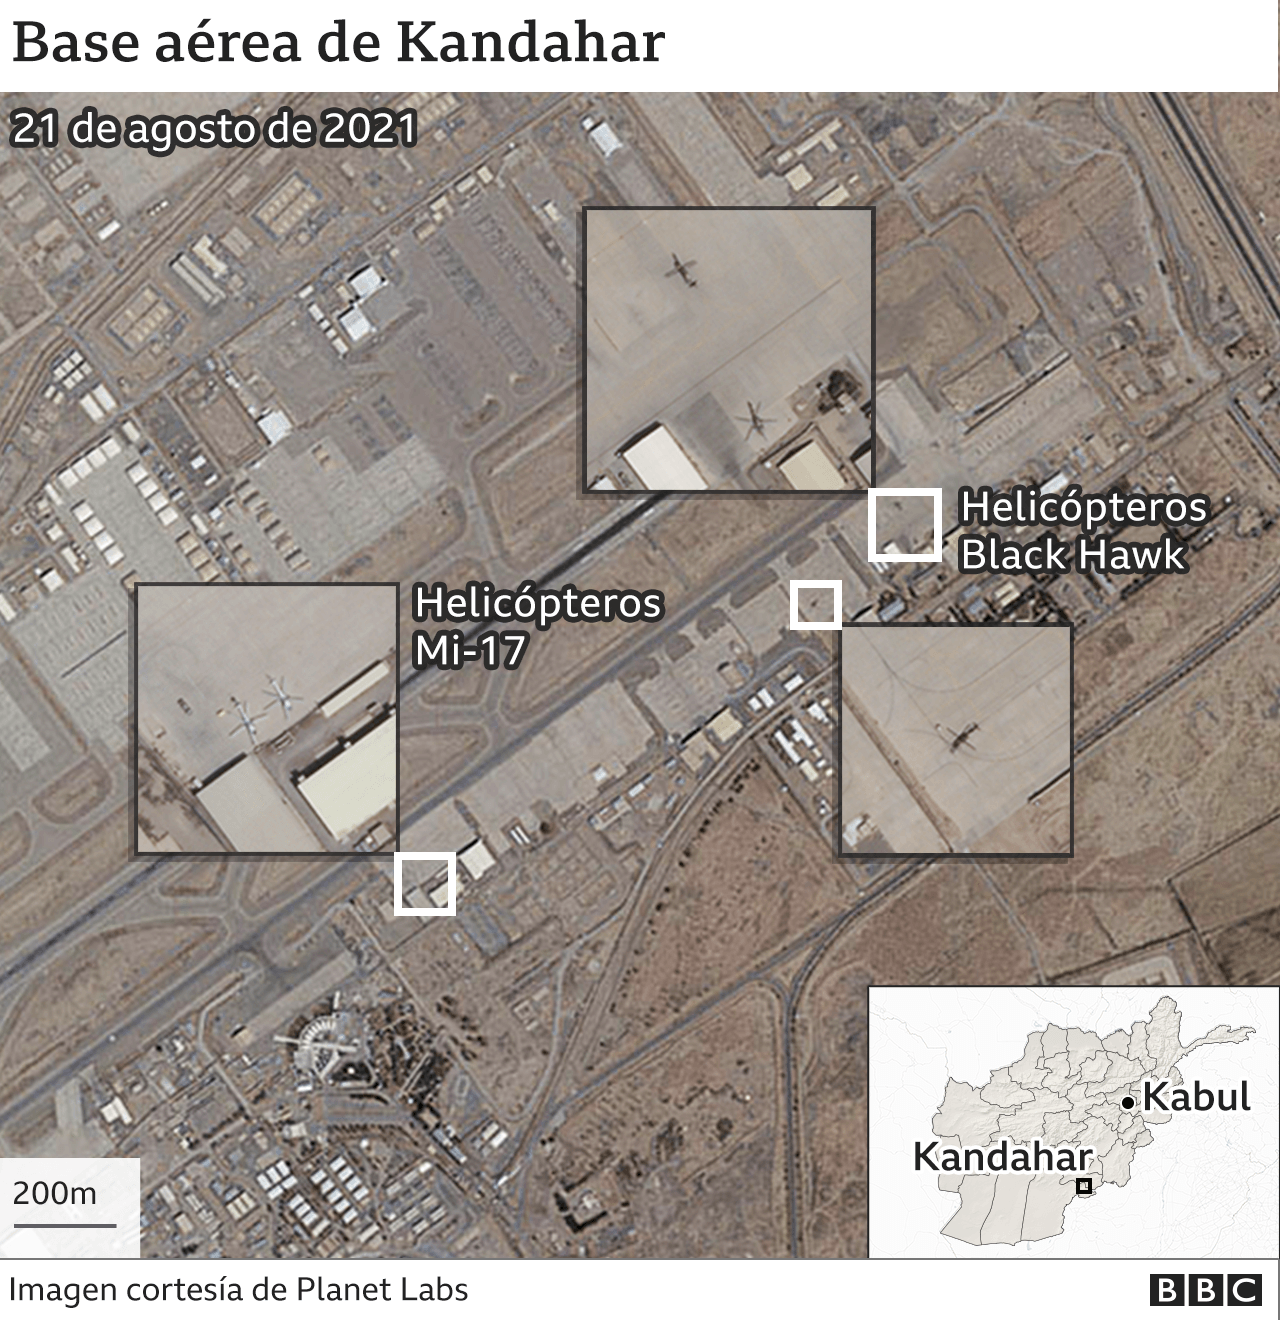 Base Aerea Kandahar